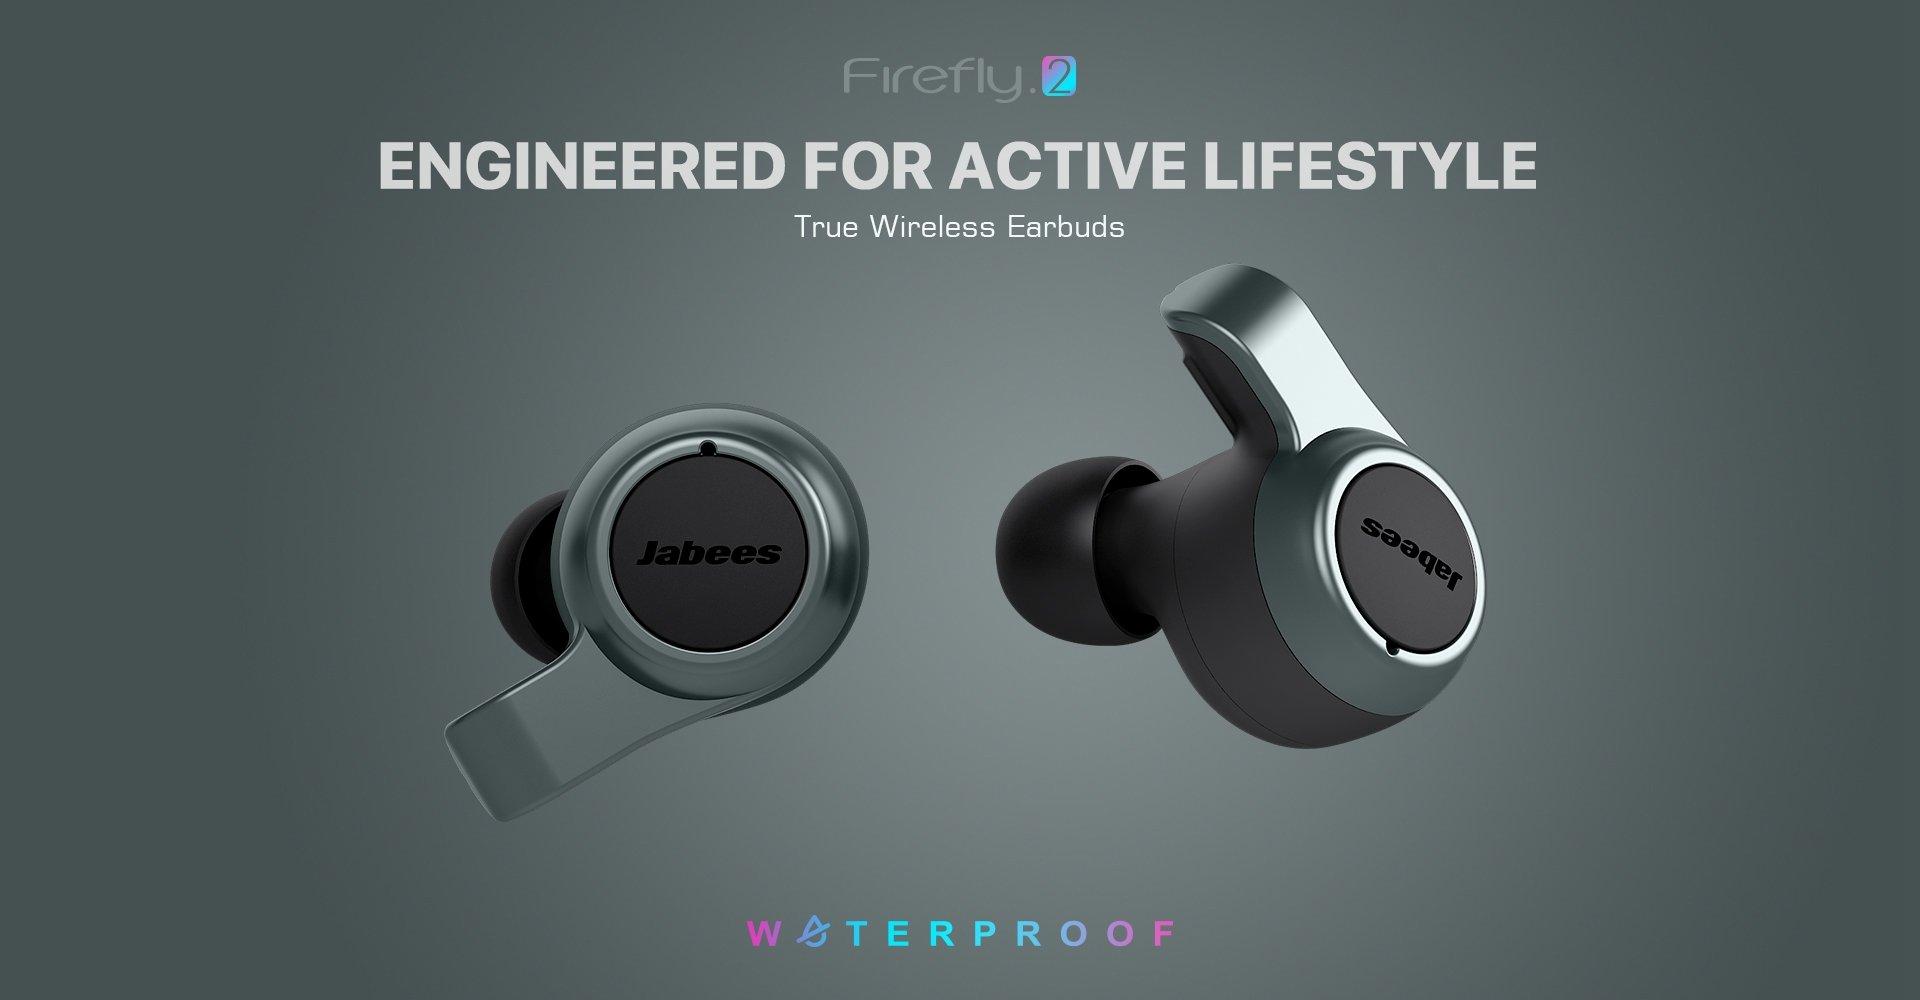 Jabees Firefly 2 Black Touch TWS Earbuds Waterproof & Dustproof IPX7 1